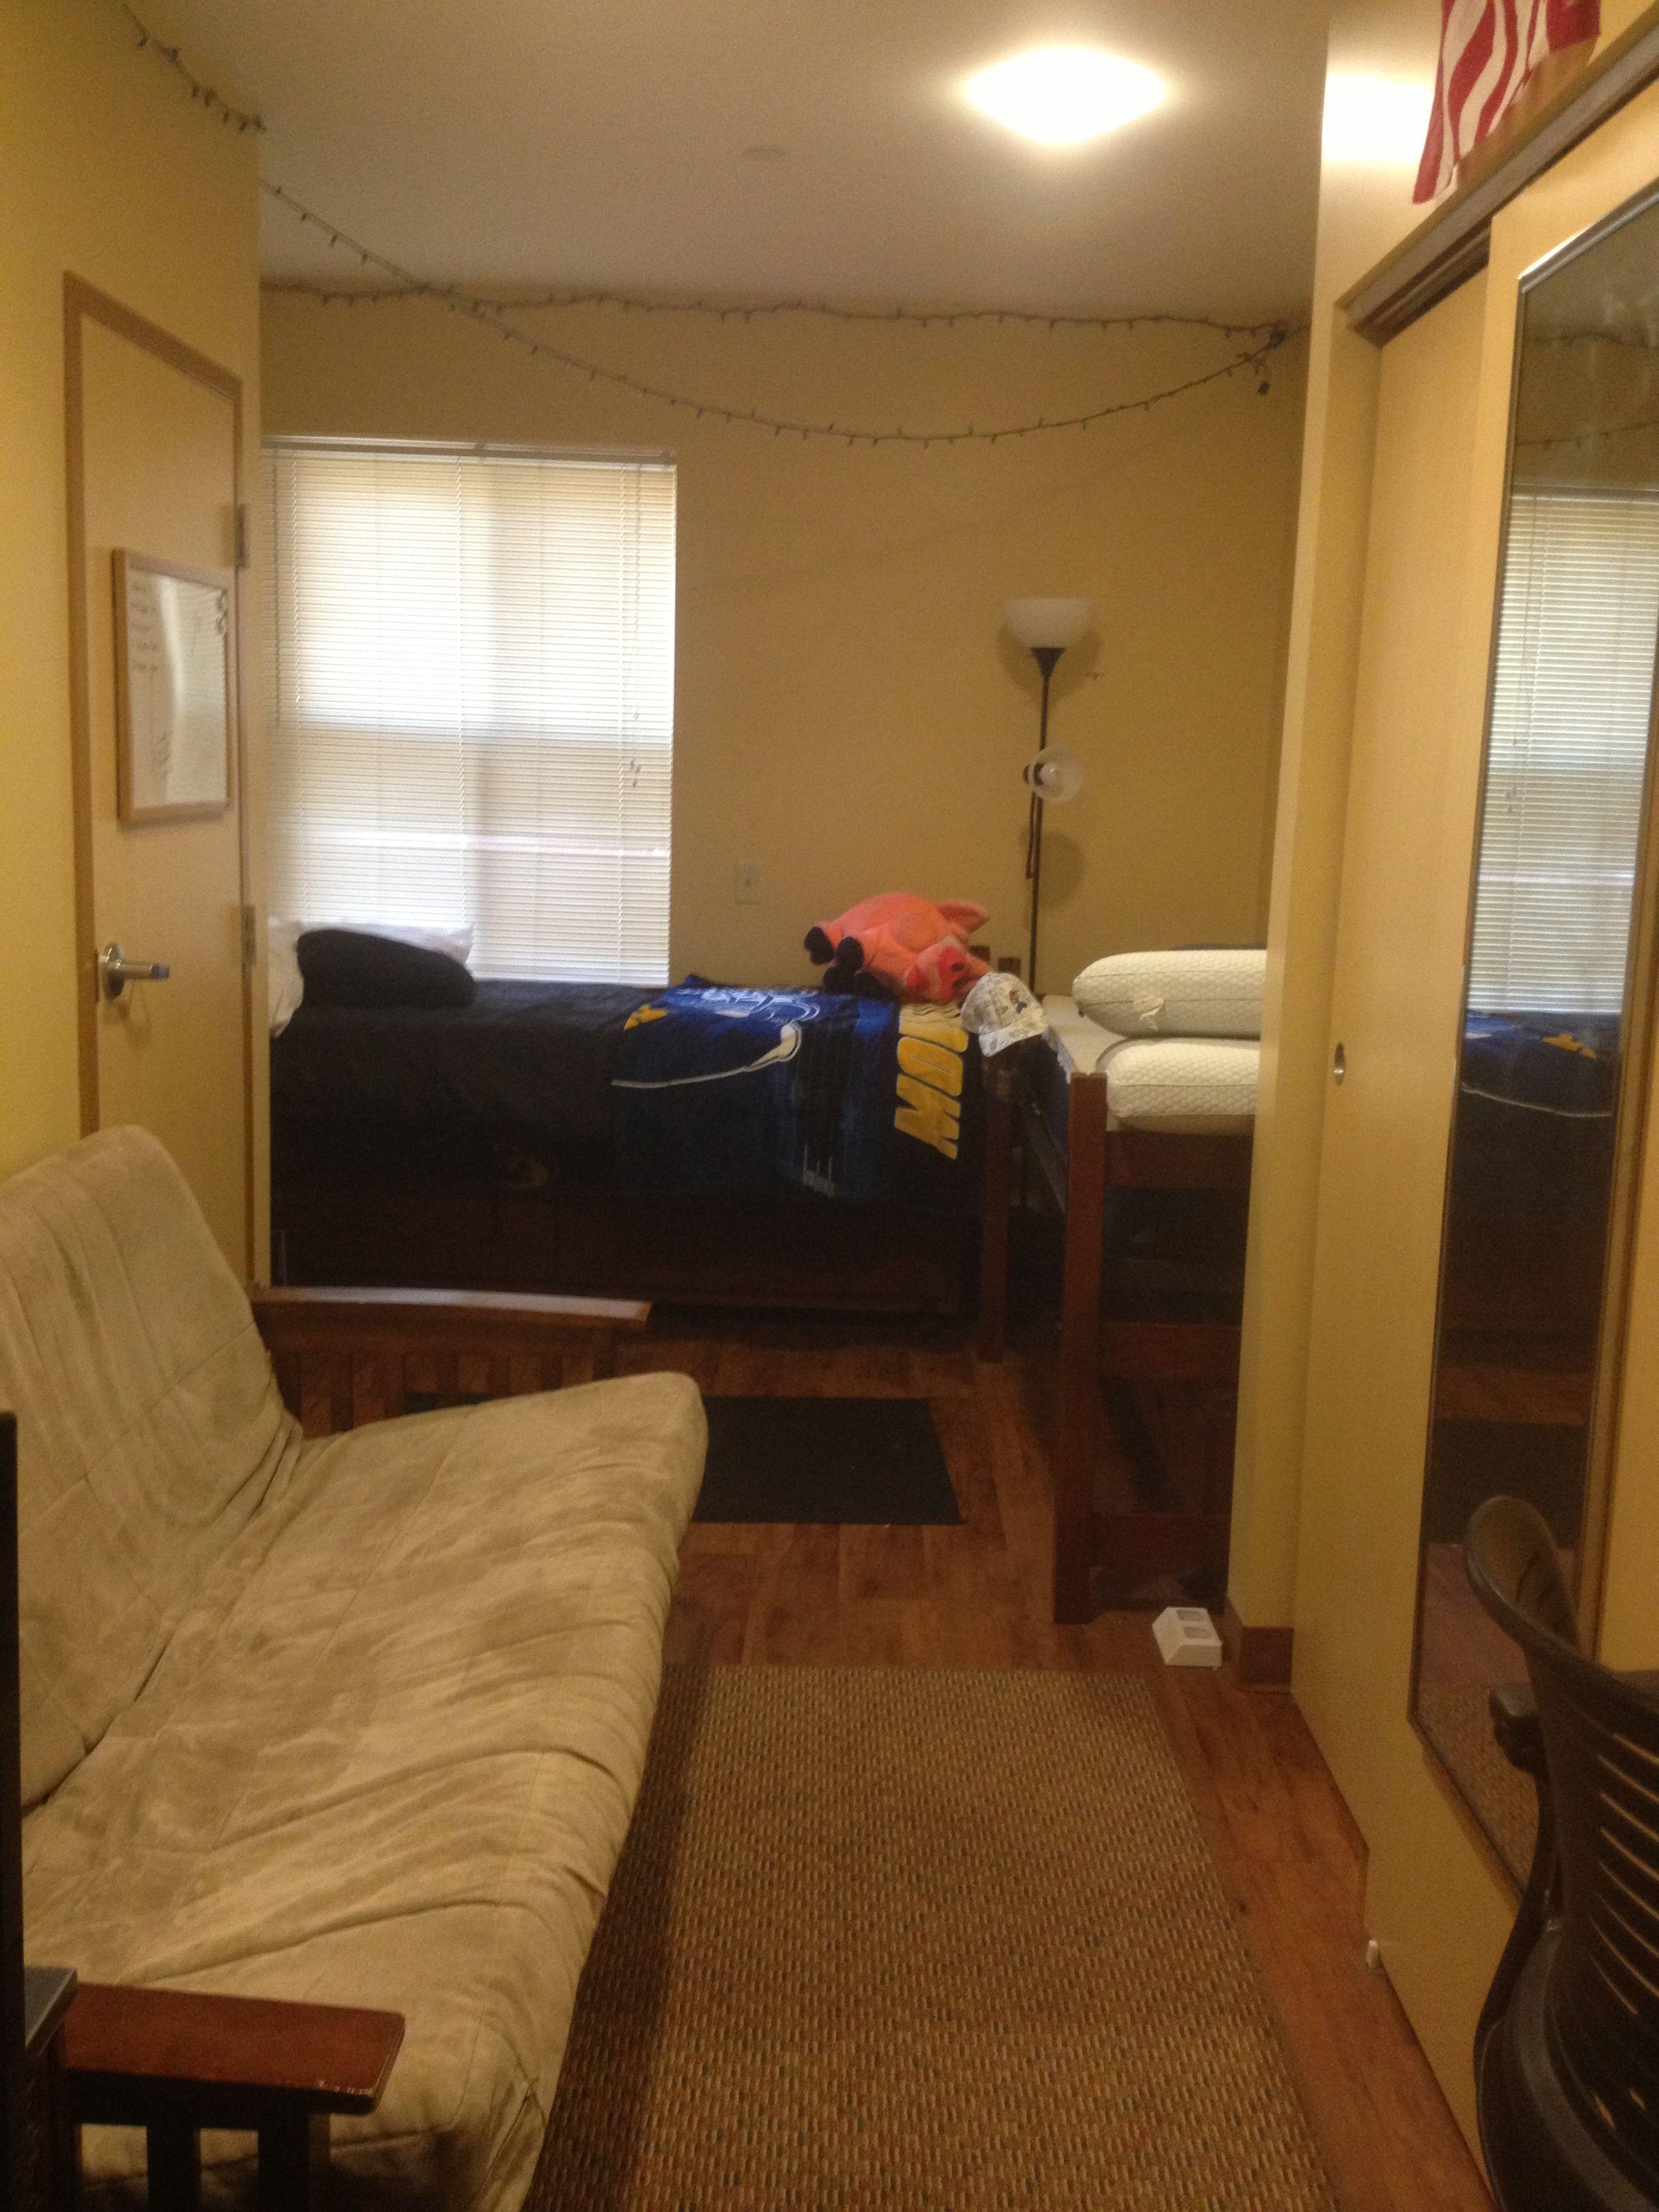 Honors Hall Wvu Room Home Home Decor